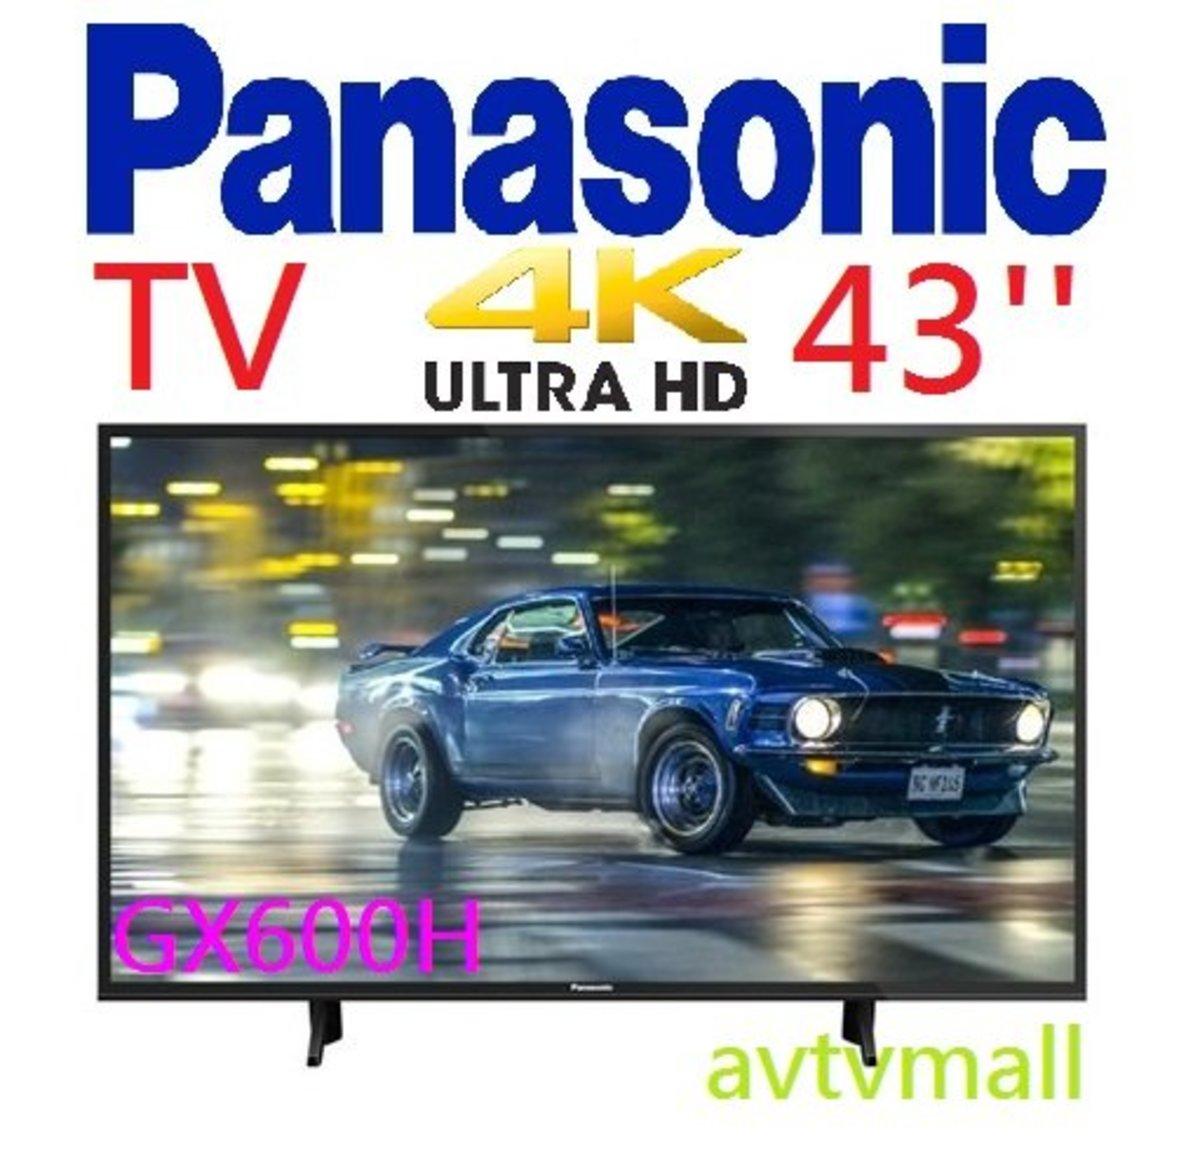 TH 43GX600H 4K HDR10 HLG SMART TV (5 YEAR WARRANTY)